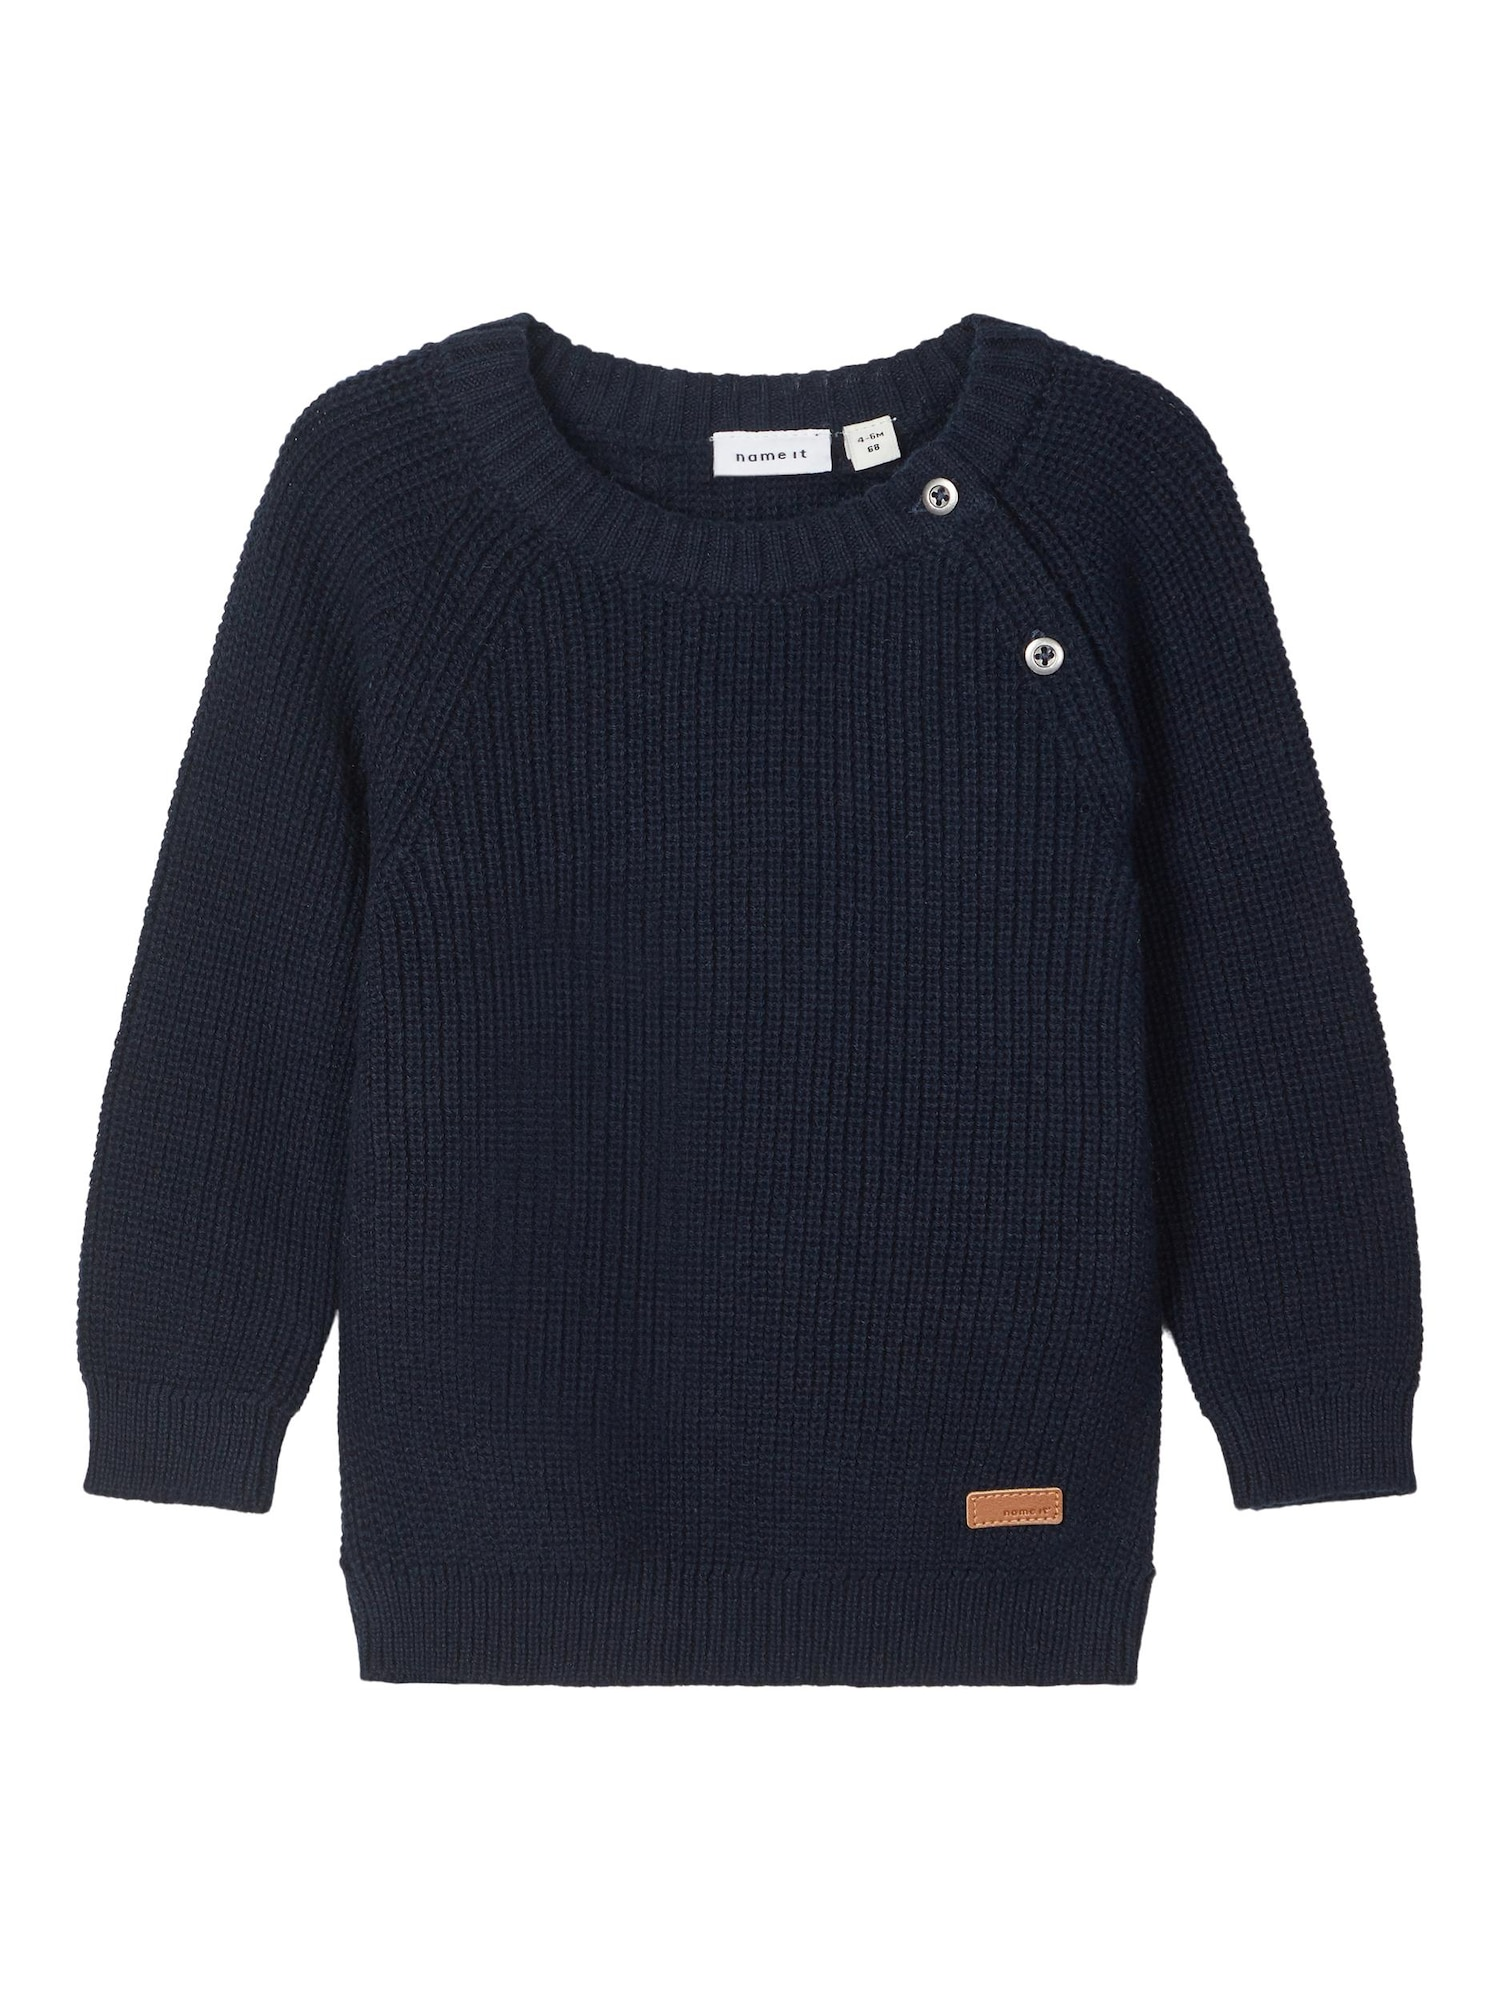 NAME IT Megztinis mėlyna